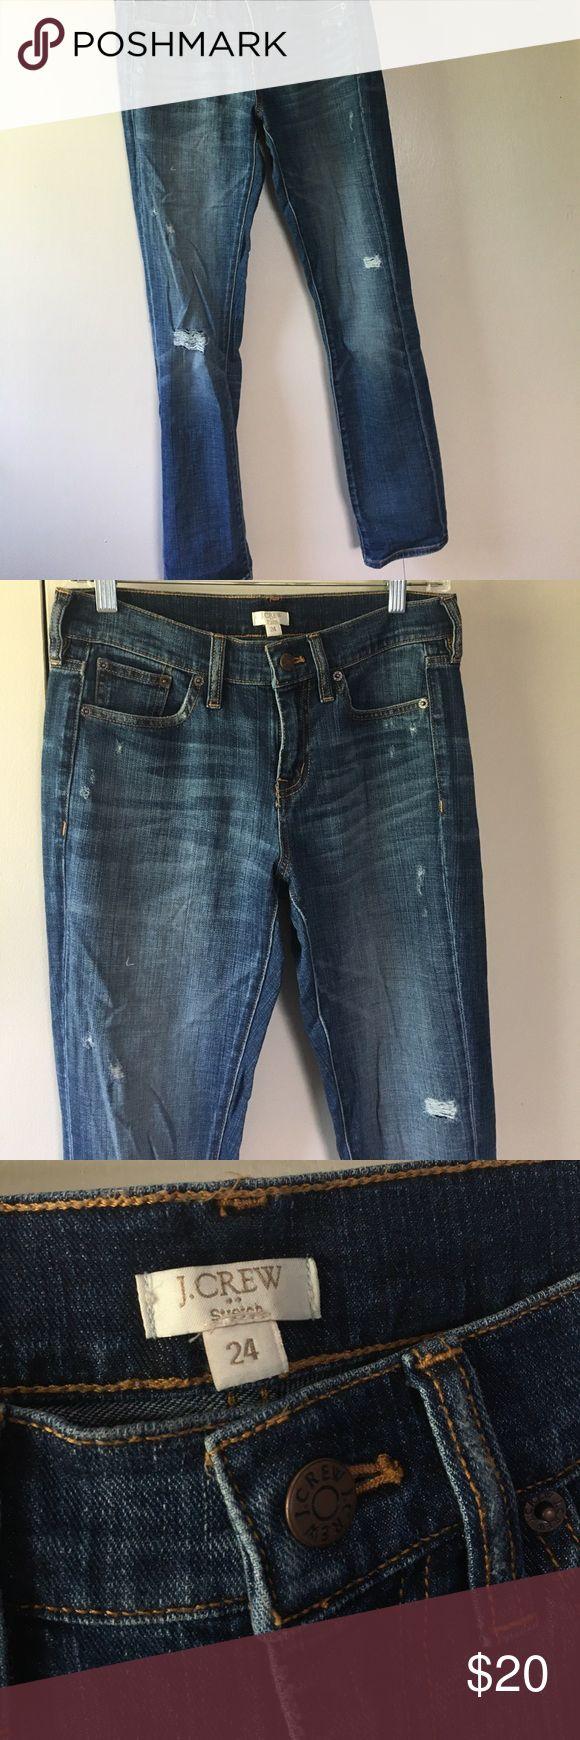 J Crew distressed boyfriend jeans size 24 J crew Factory J. Crew Jeans Boyfriend